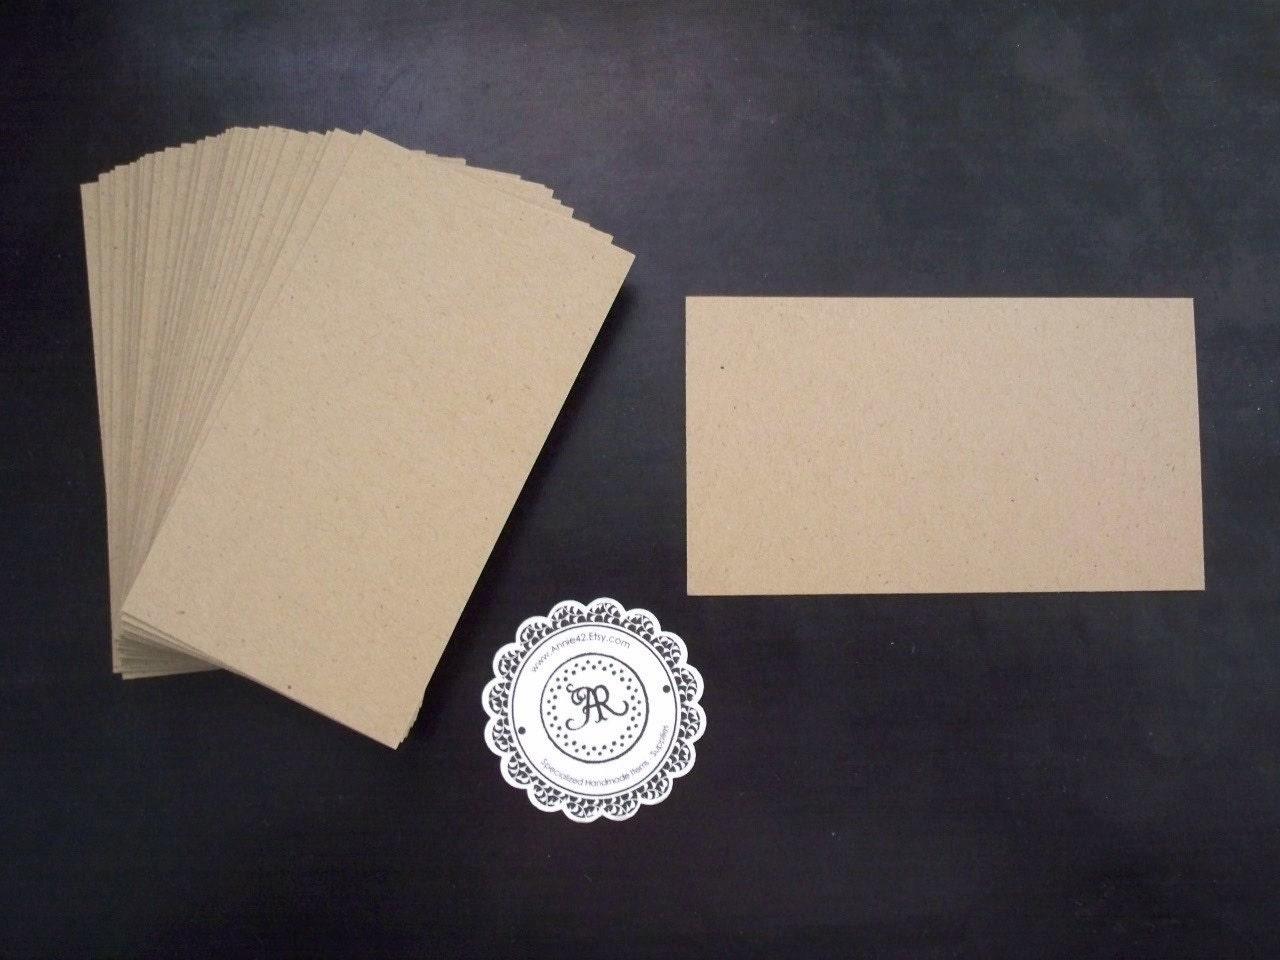 бланк визитная карточка